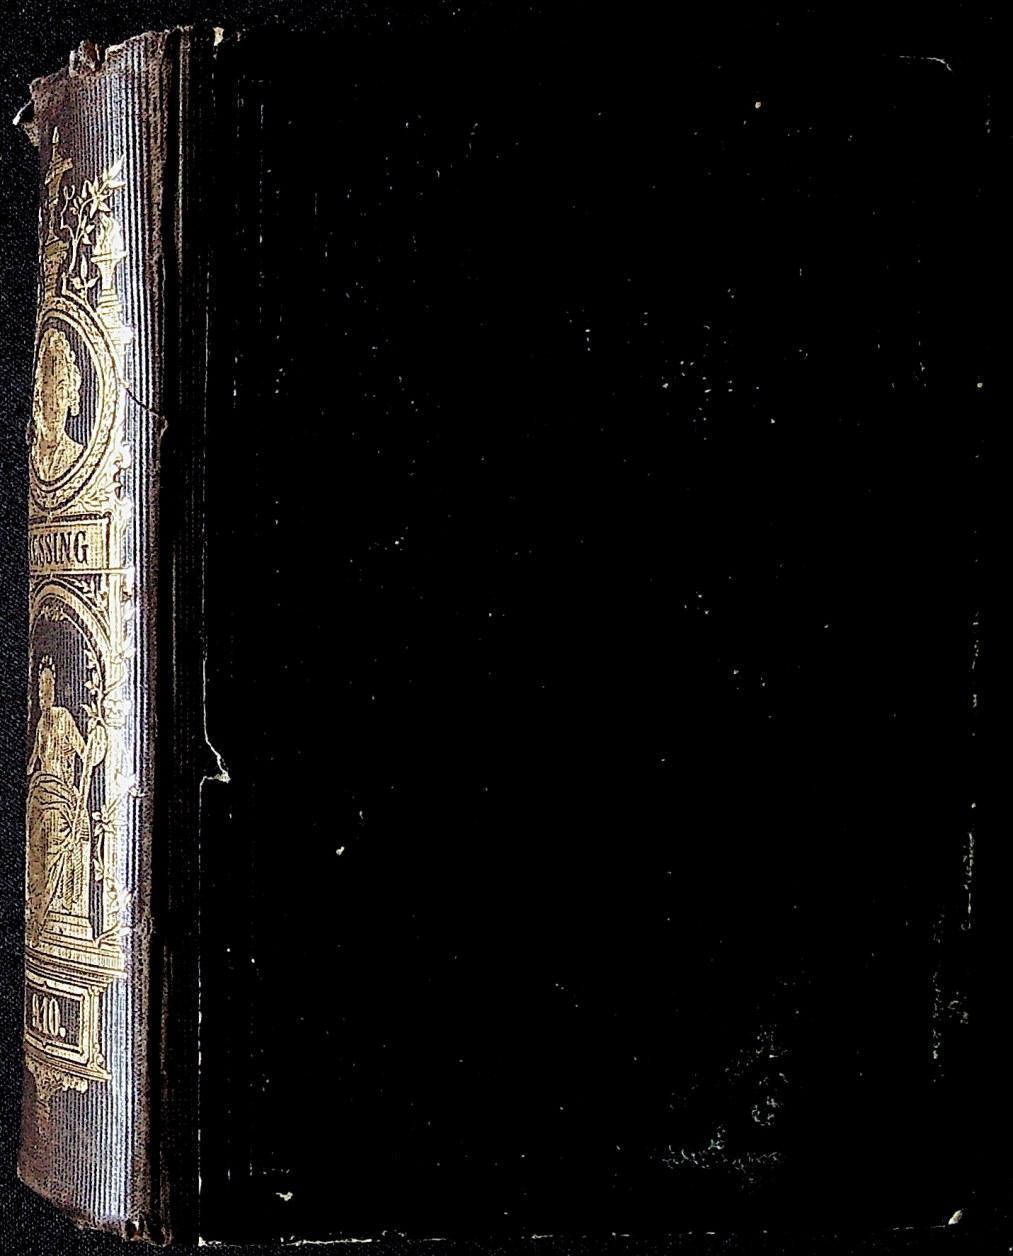 pdf Populism, Gender, and Sympathy in the Romantic Novel (Nineteenth Century Major Lives